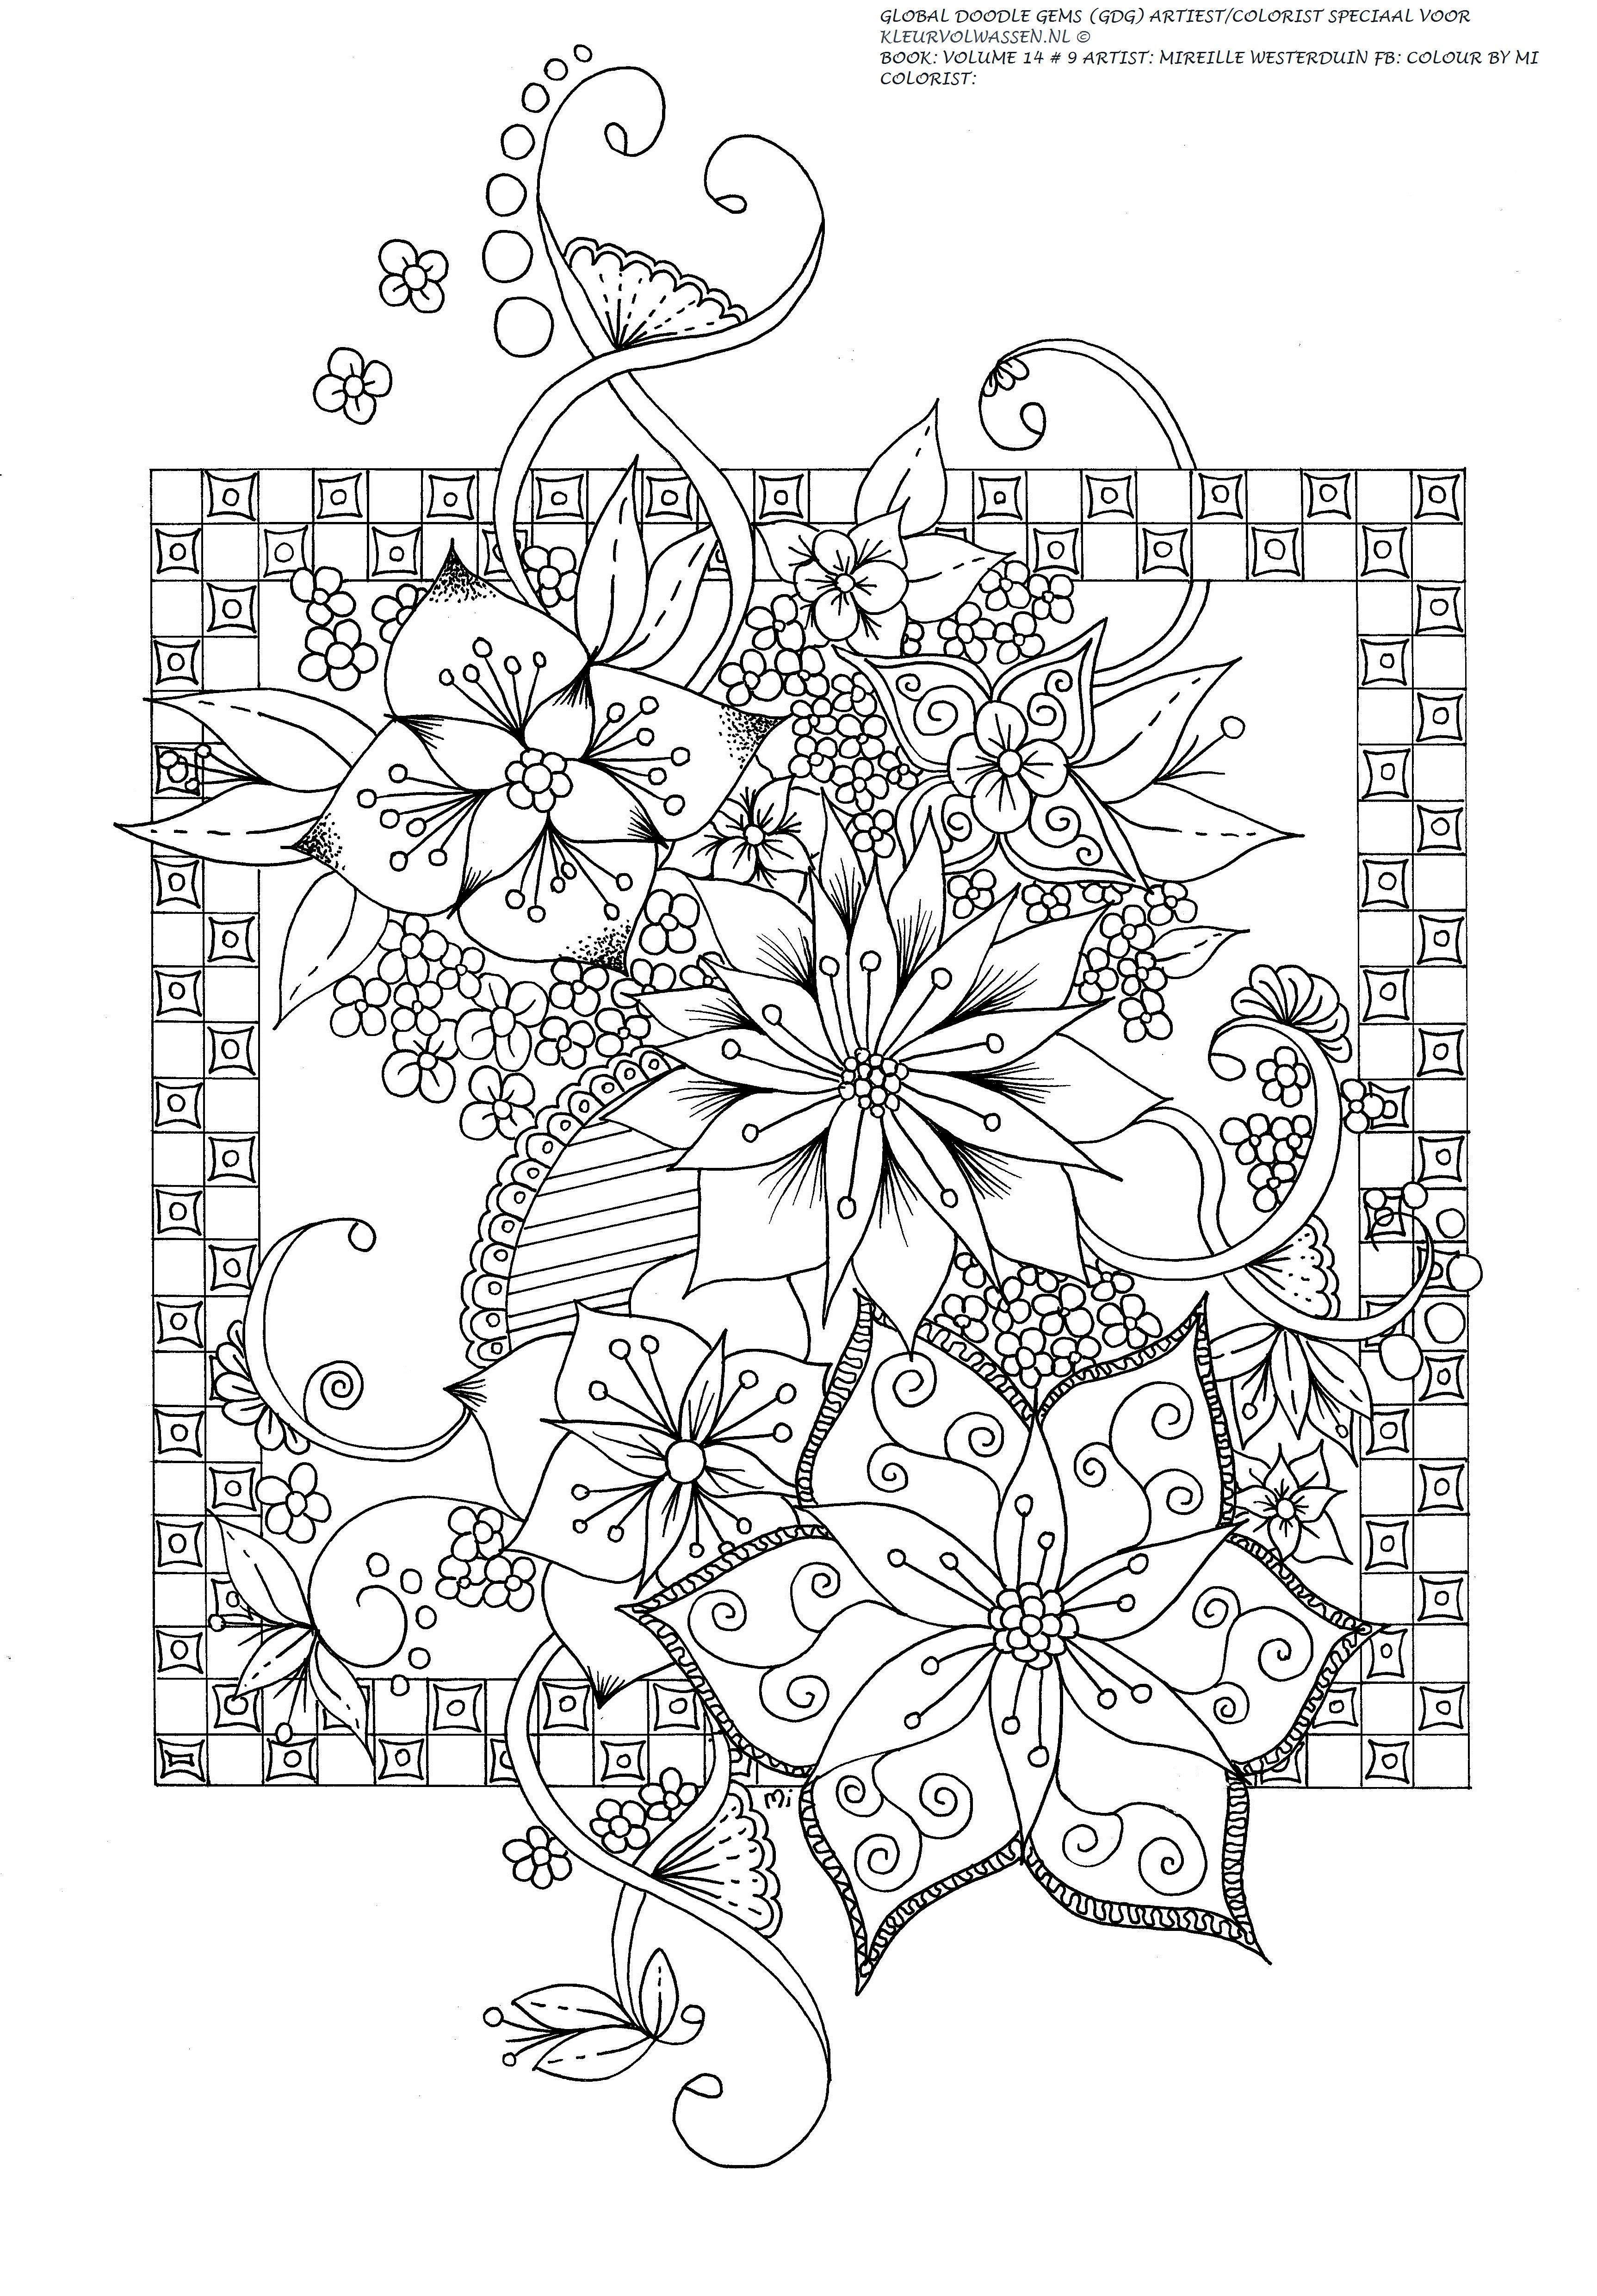 mireille-westerduin-colour-by-mi-vol-14-9.jpg (3452×4962)